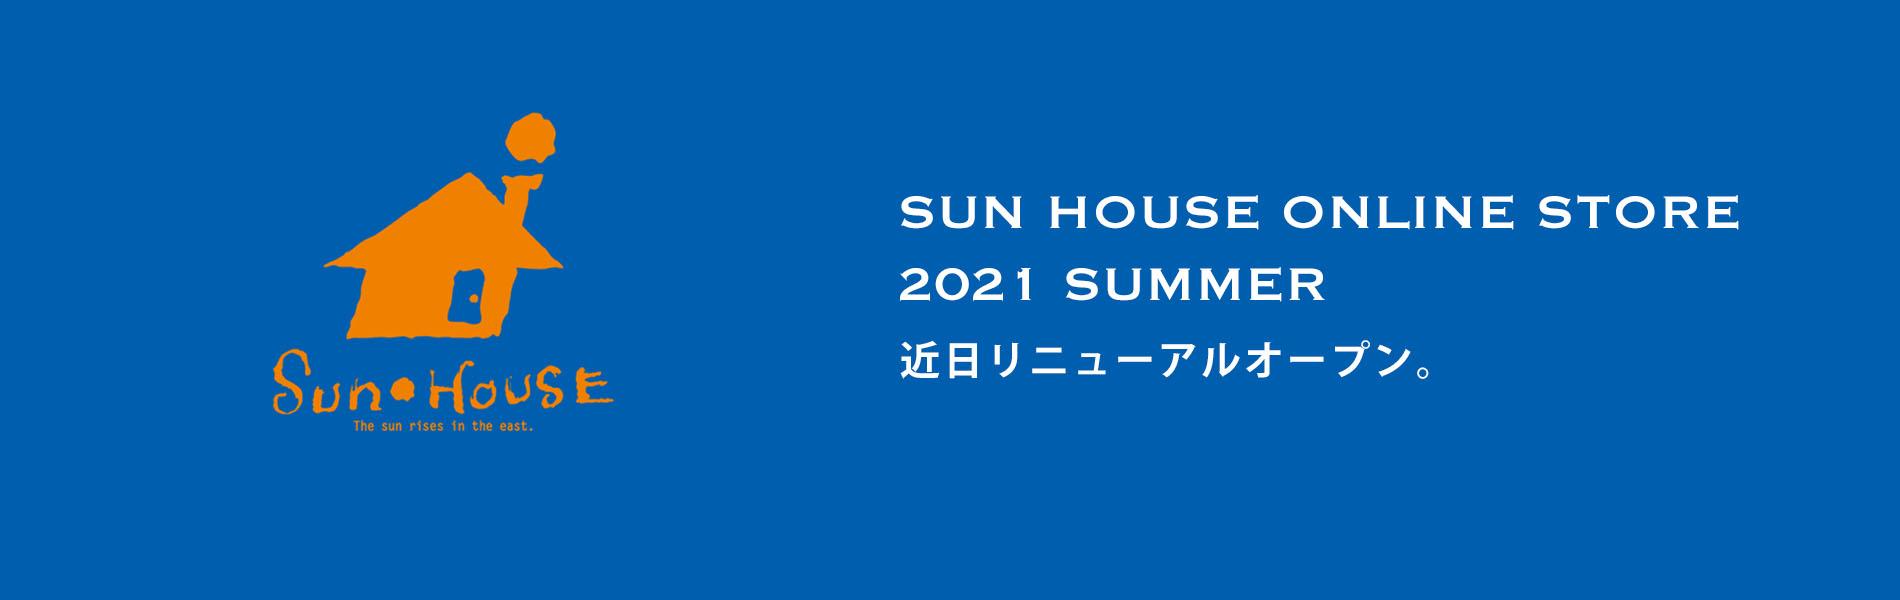 SUN HOUSE ONLINE STORE 近日リニューアル